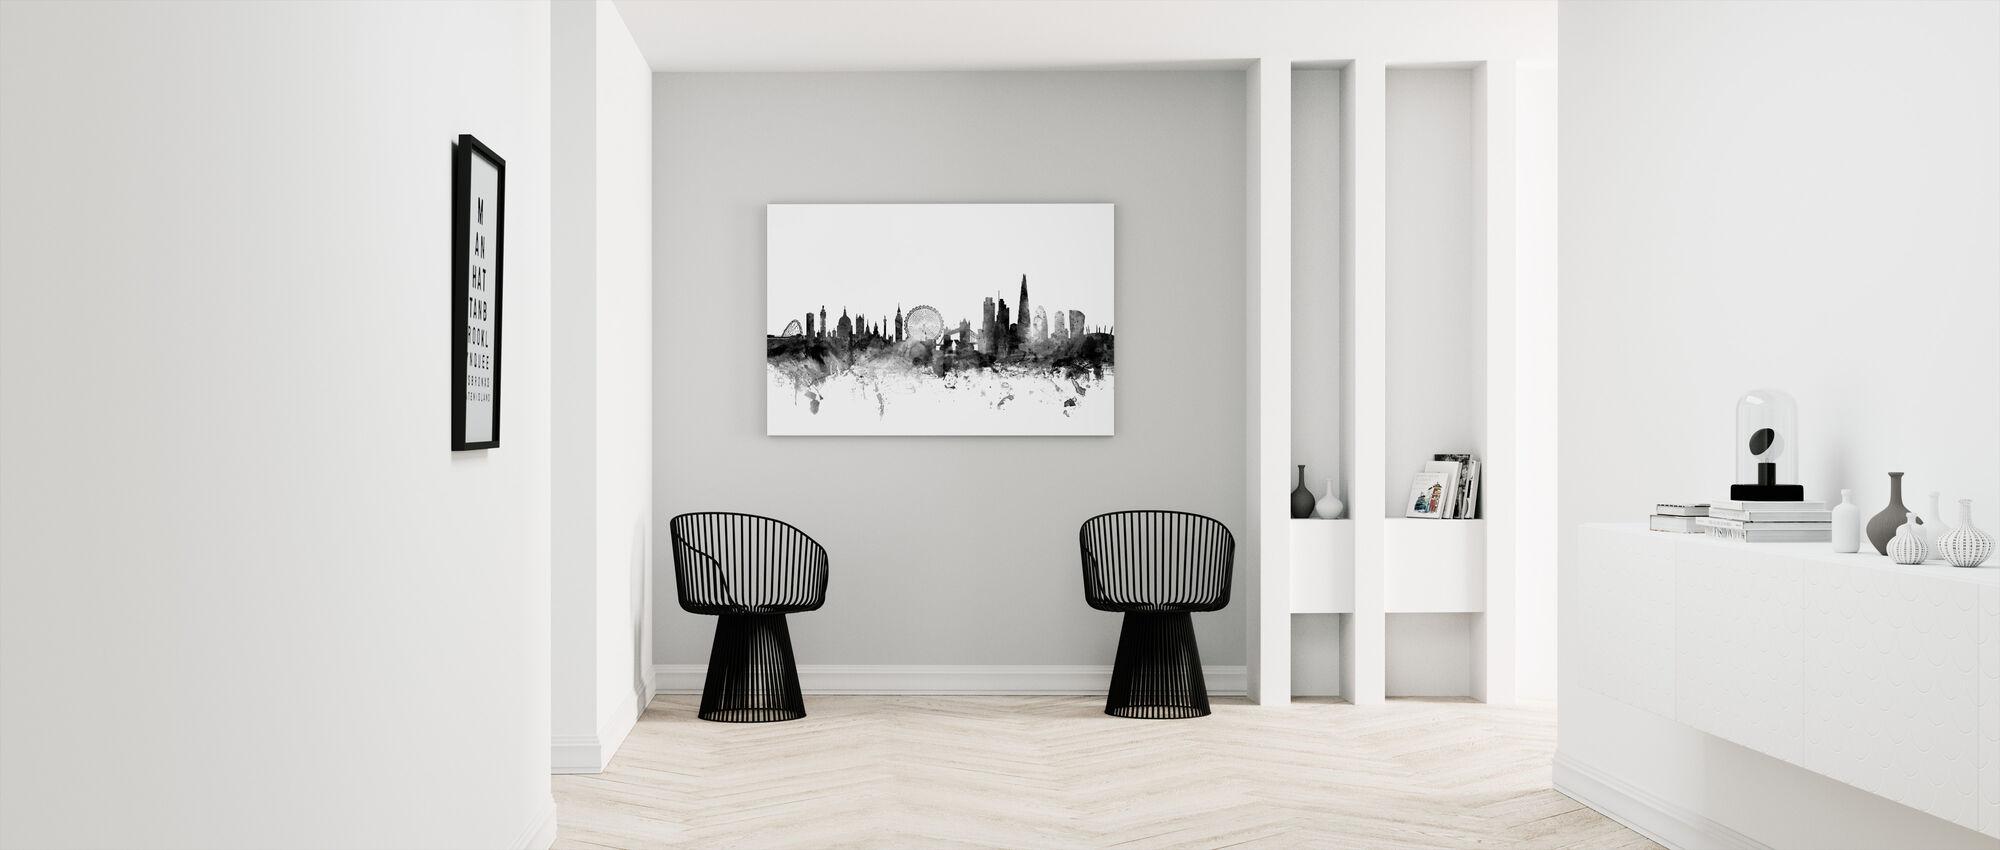 London Skyline 2 Black - Canvas print - Hallway